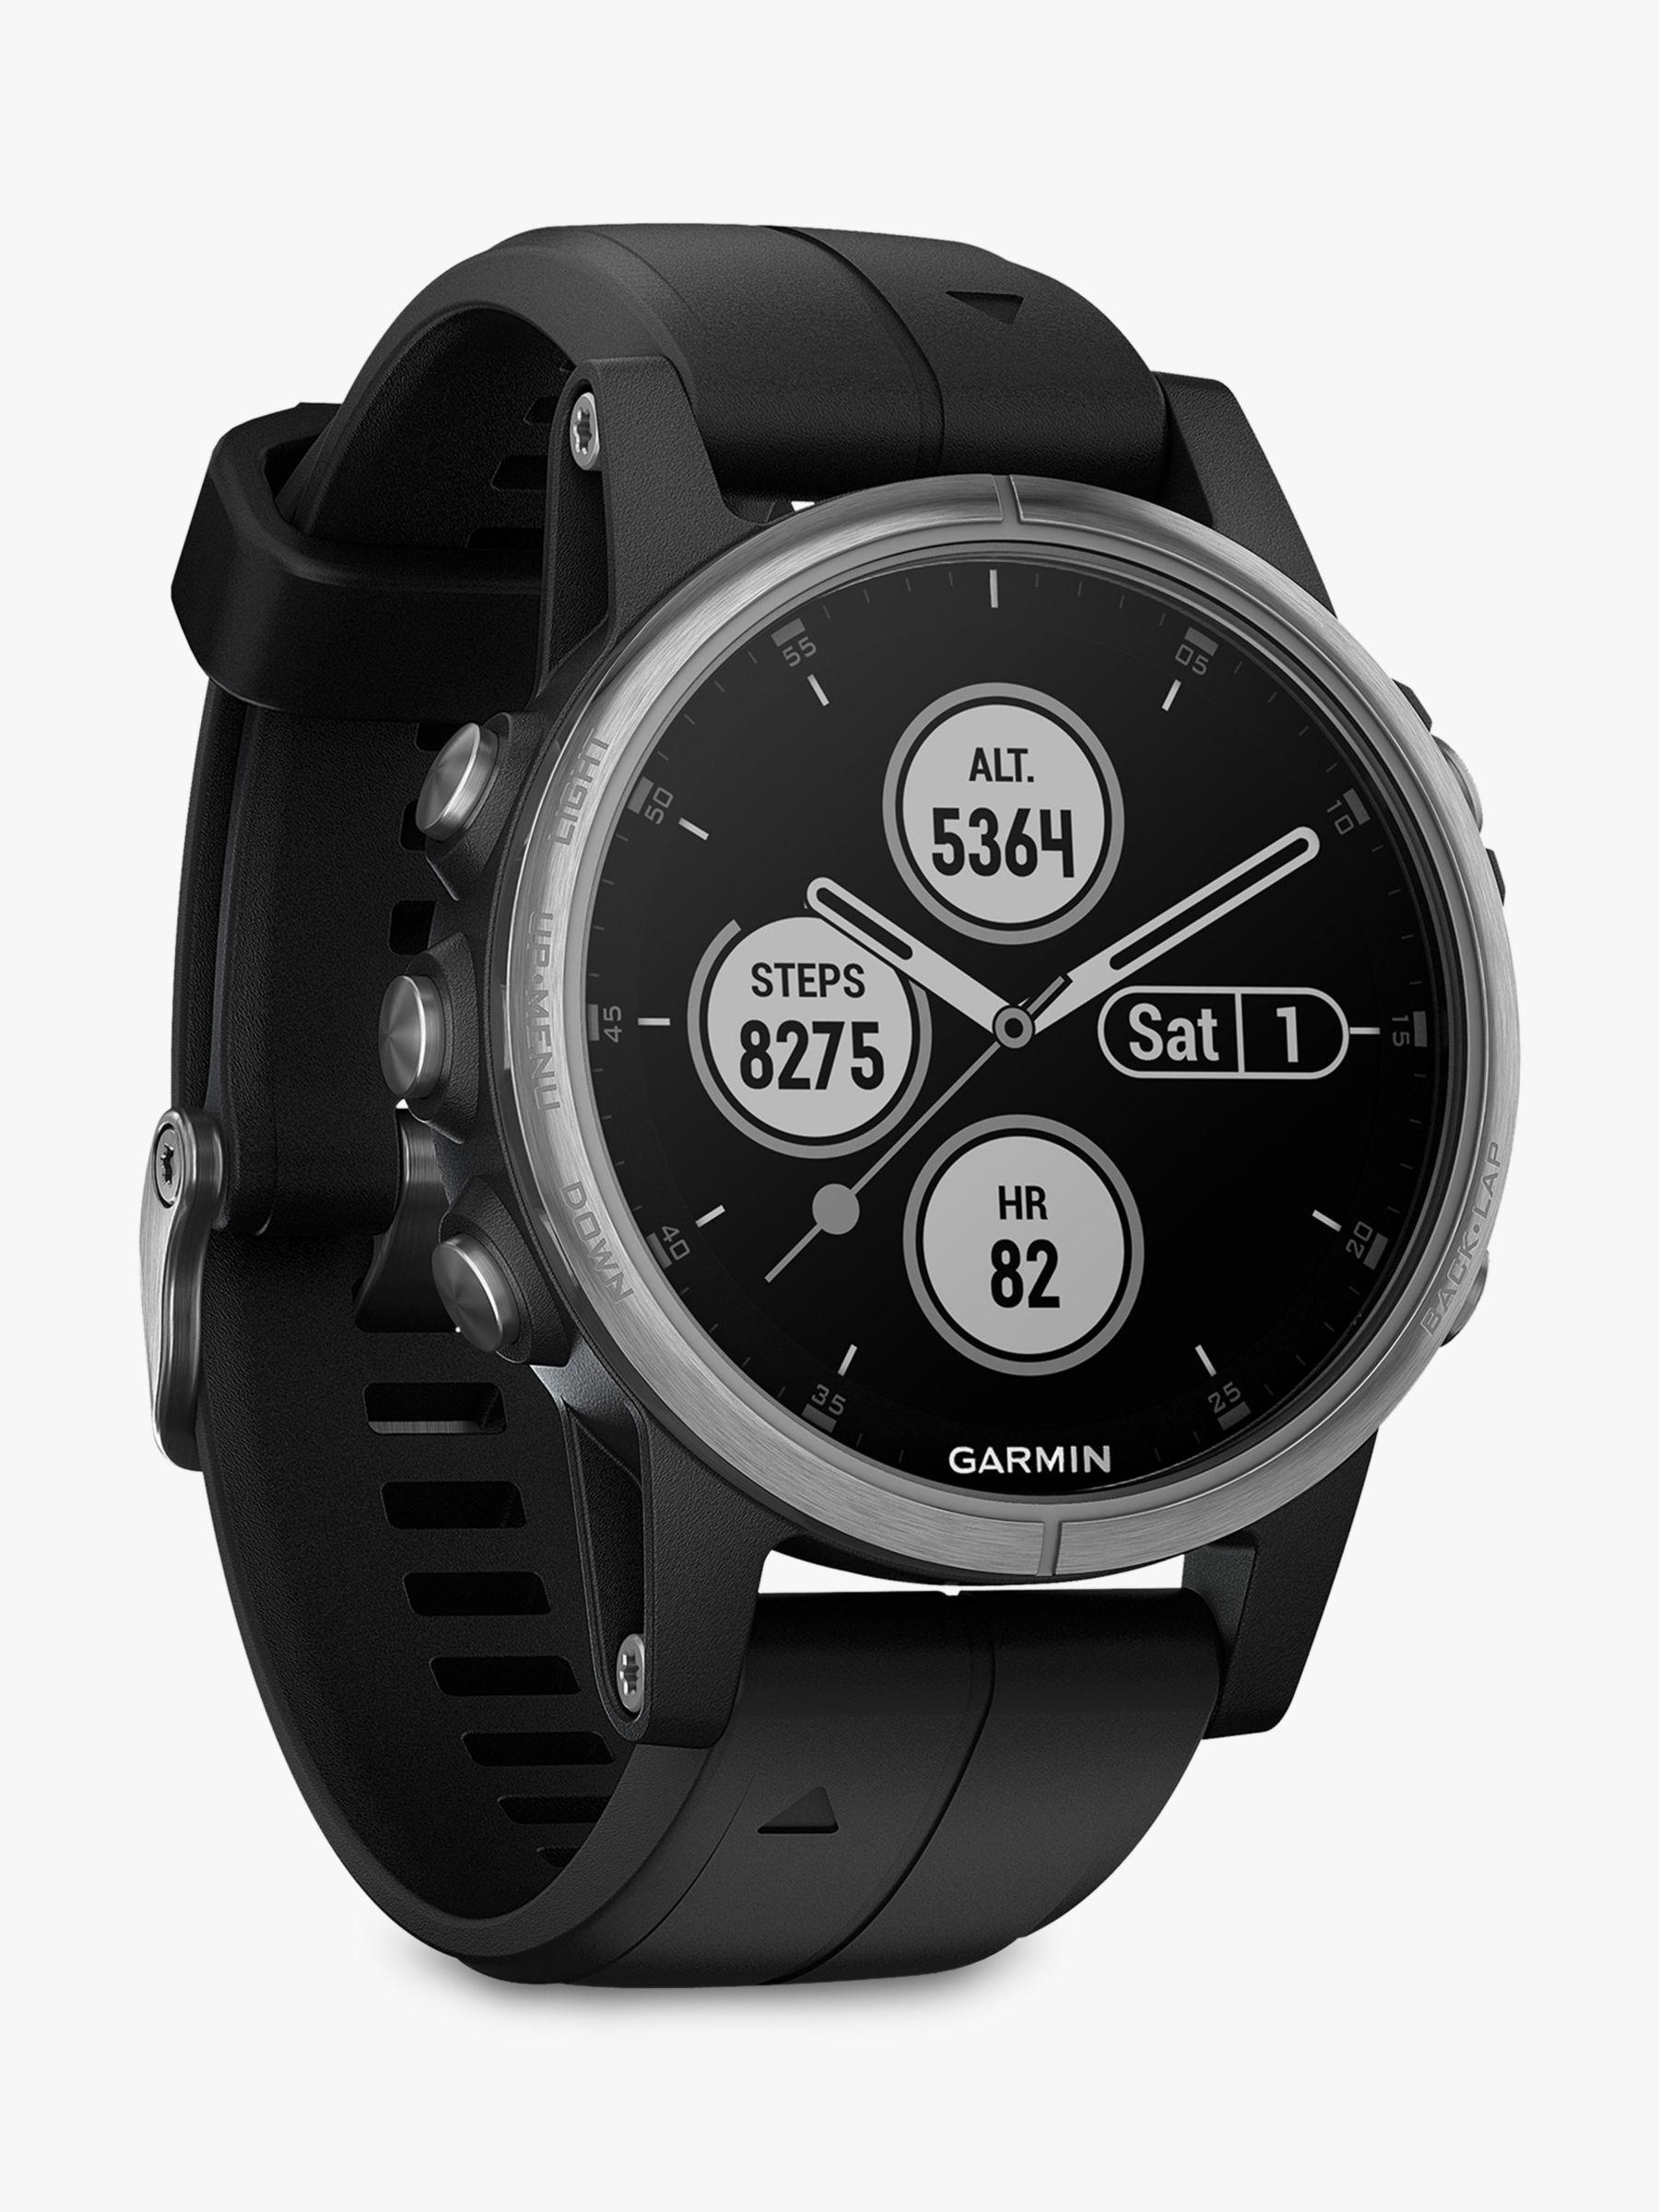 Garmin Garmin fēnix 5S Plus GPS Multisport Watch, Silver with Black Band, 4.2cm